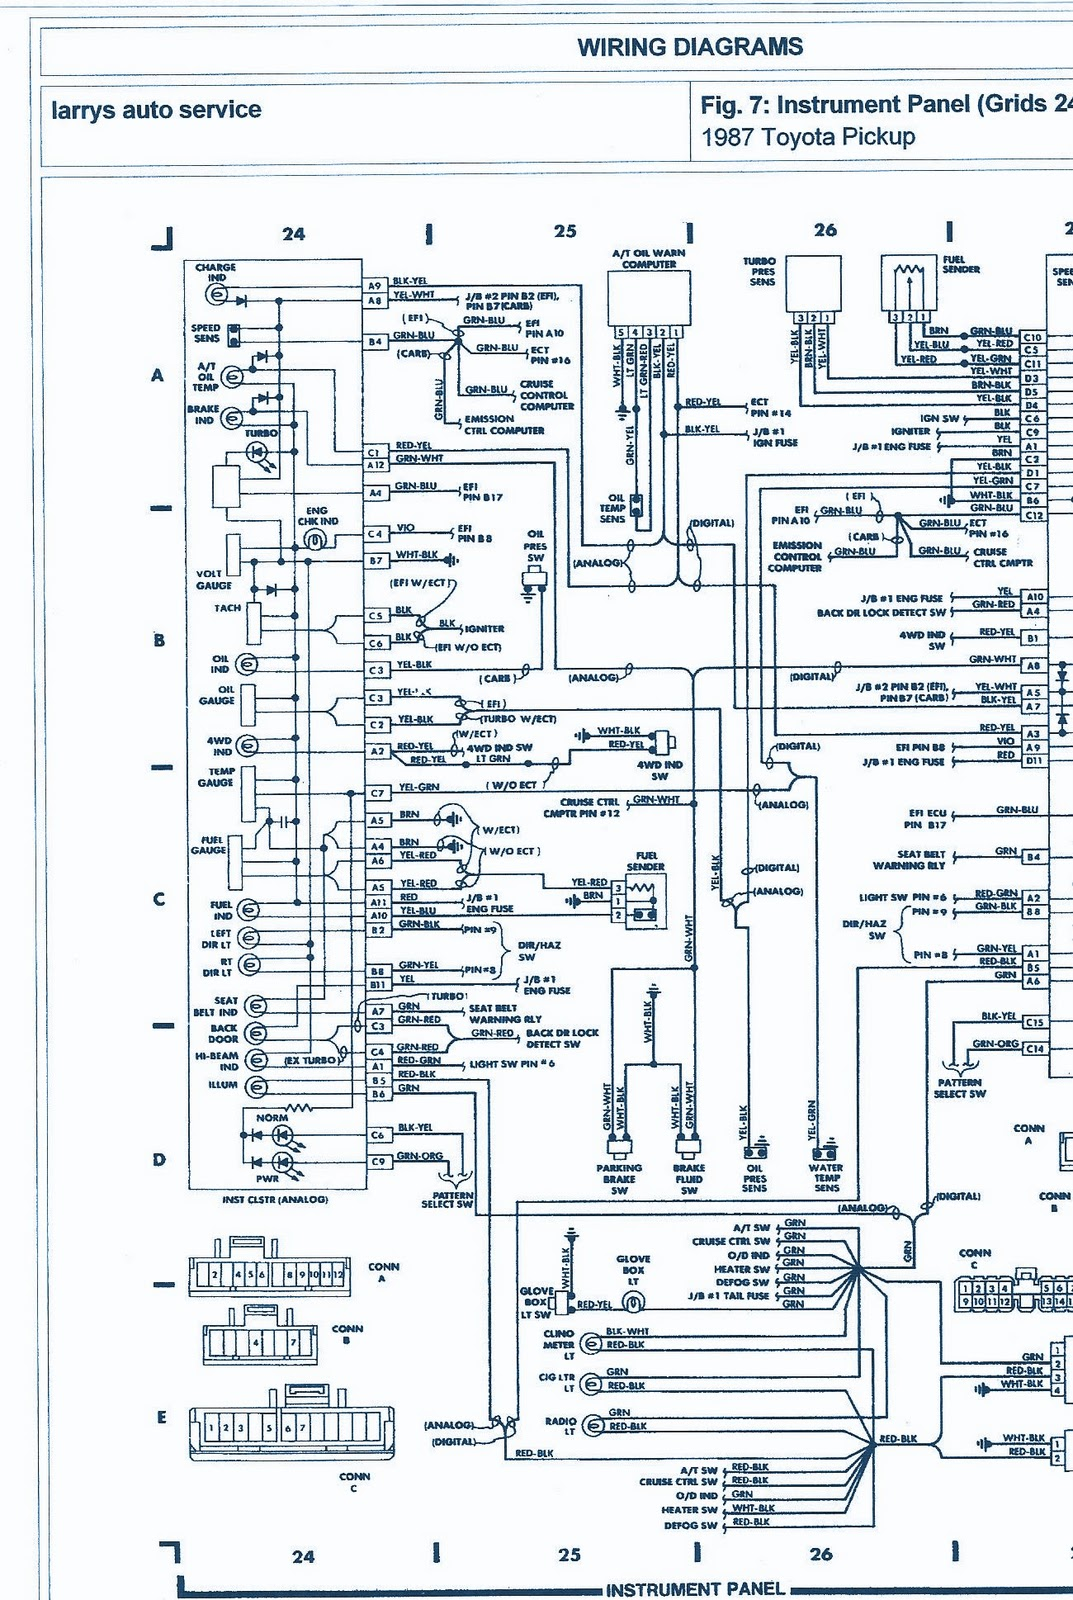 1985 Toyota Ecu Wiring Diagram Electrical Diagrams Nissan Ca18det 1994 Pickup Power Window Harness Diy Enthusiasts 92